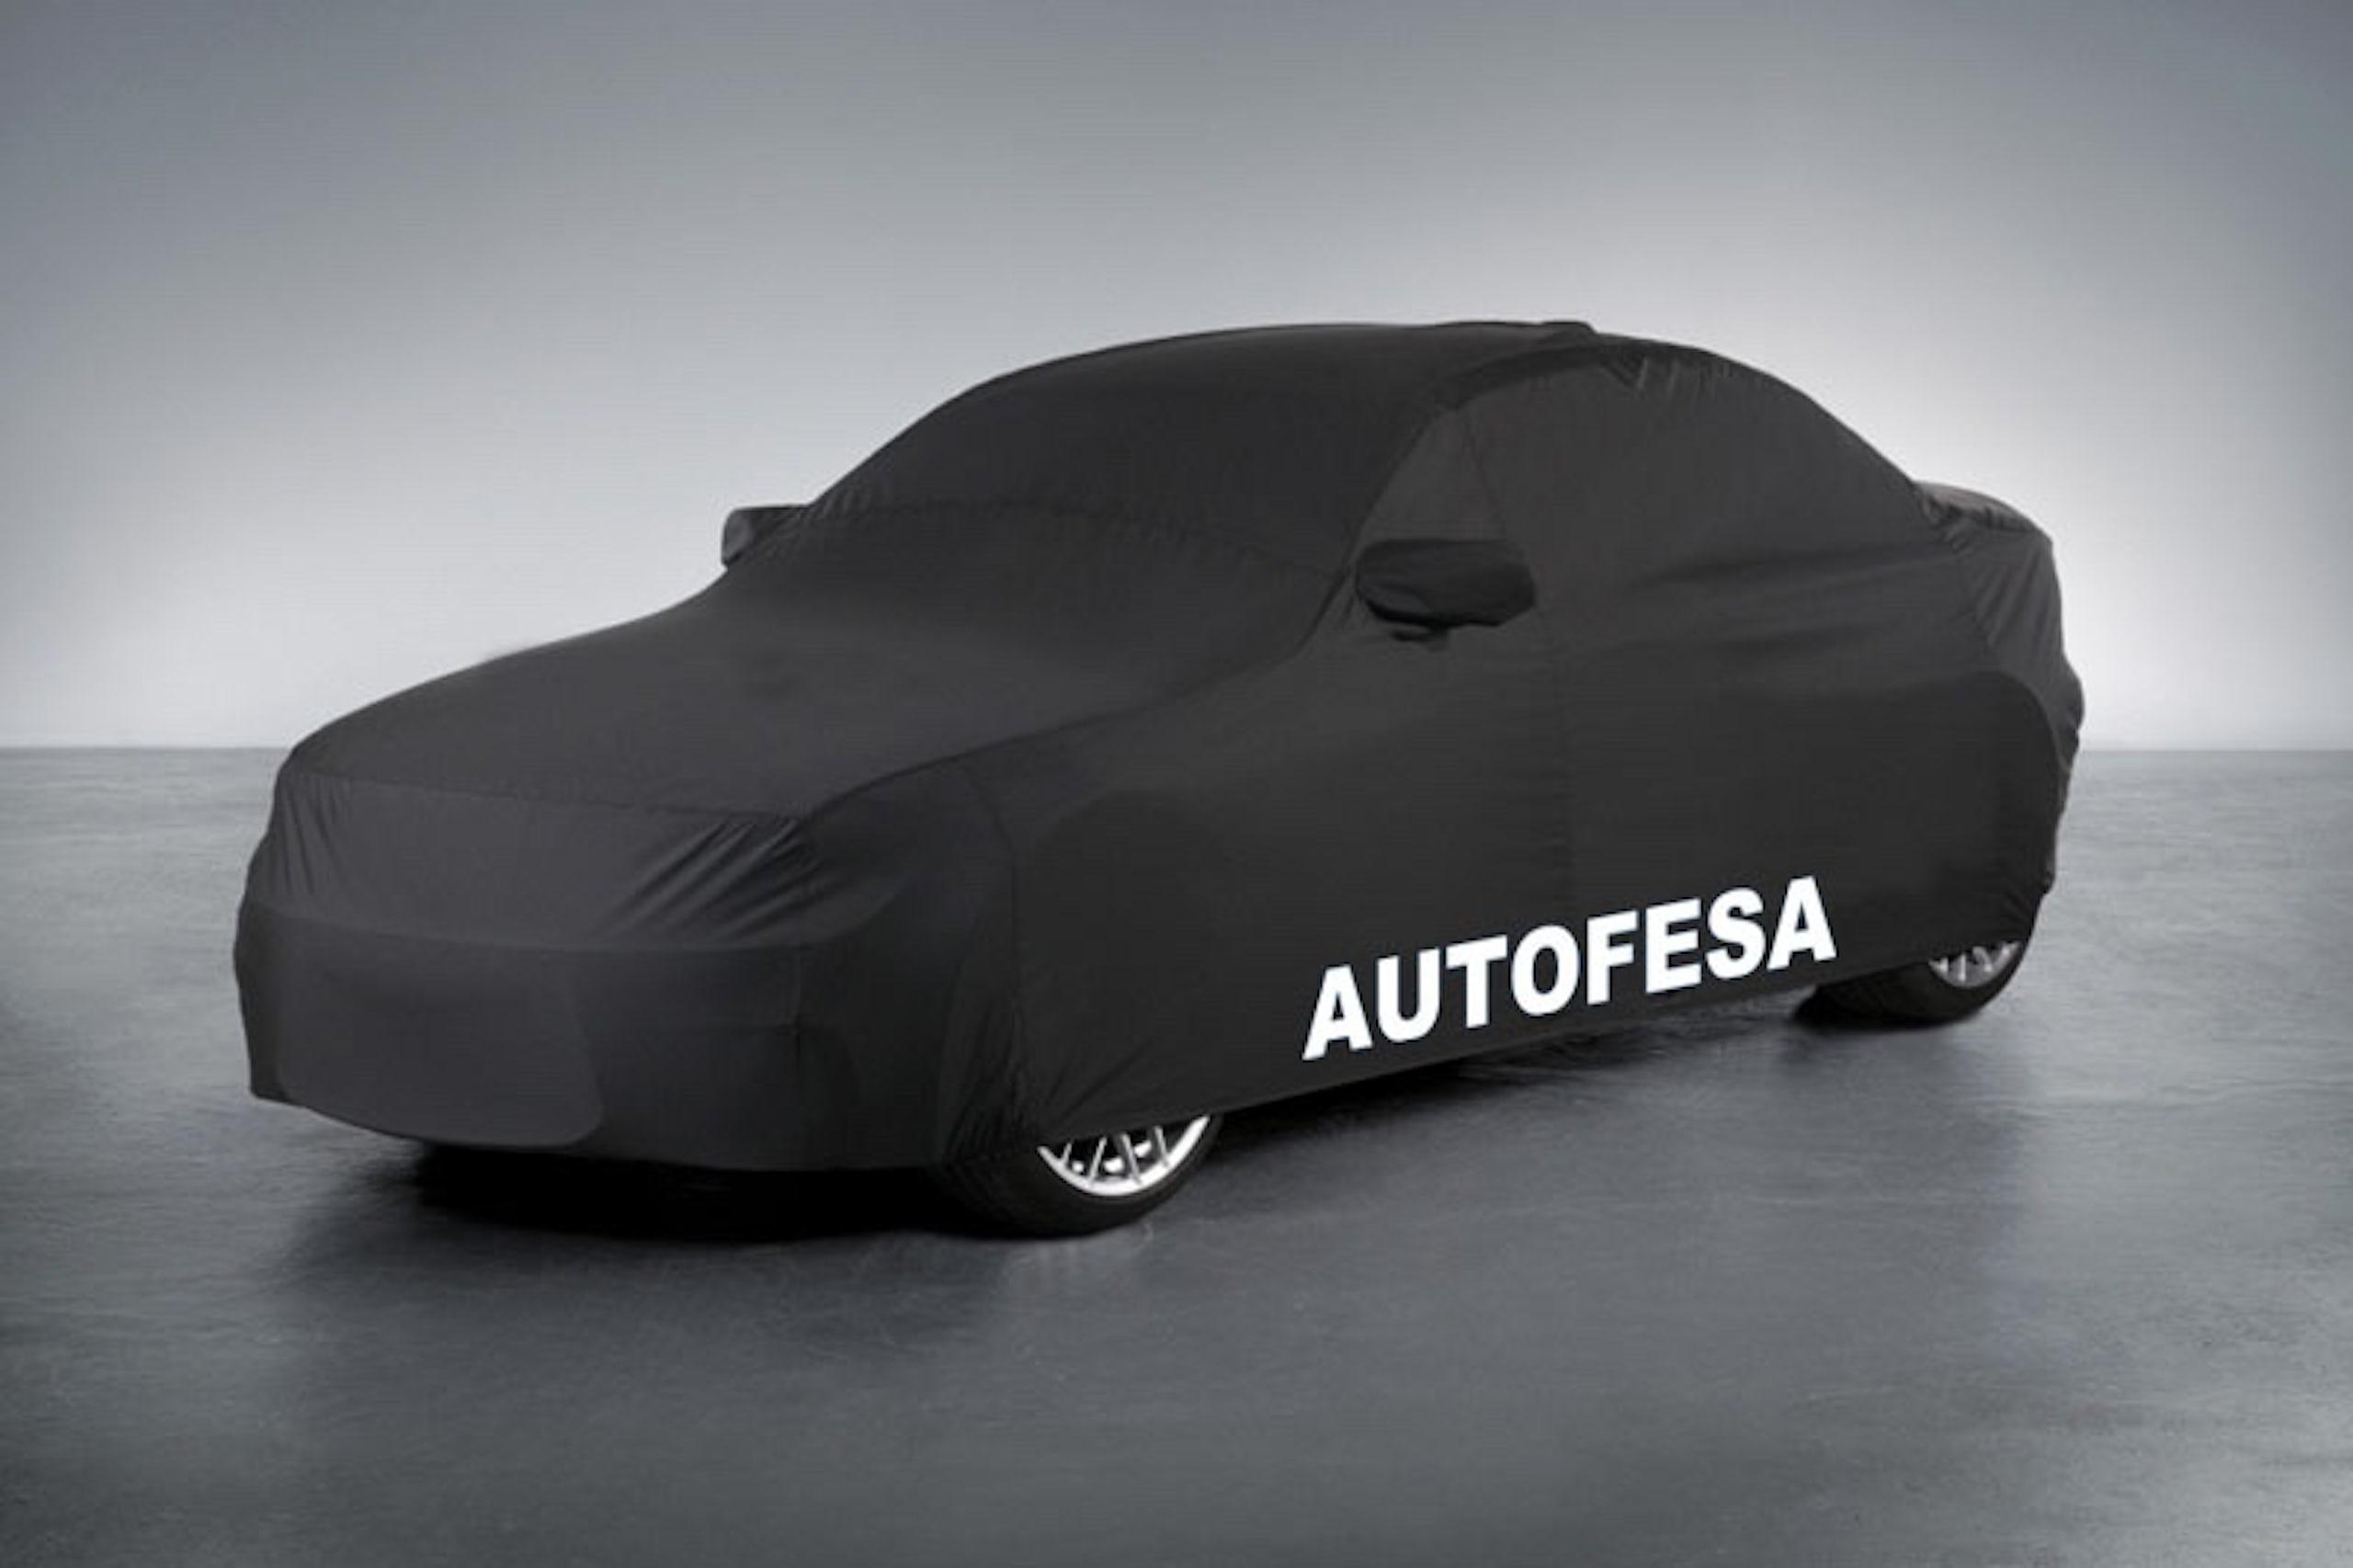 Mitsubishi Outlander 2.0 DI-D 150cv Motion 2WD 5p 7plz Auto S/S - Foto 6